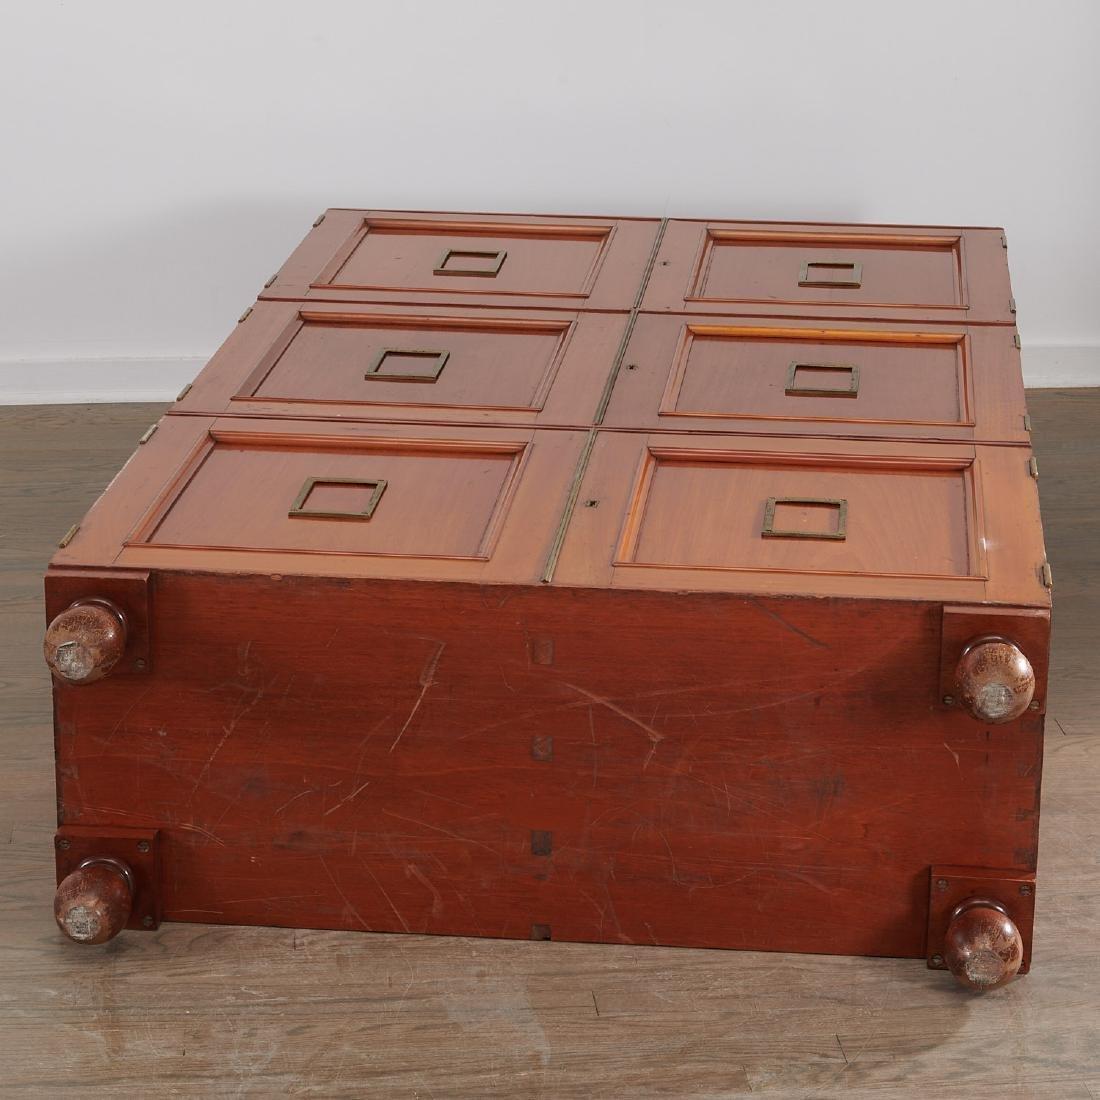 British Museum specimen cabinet by W. Cubitt & Co - 10